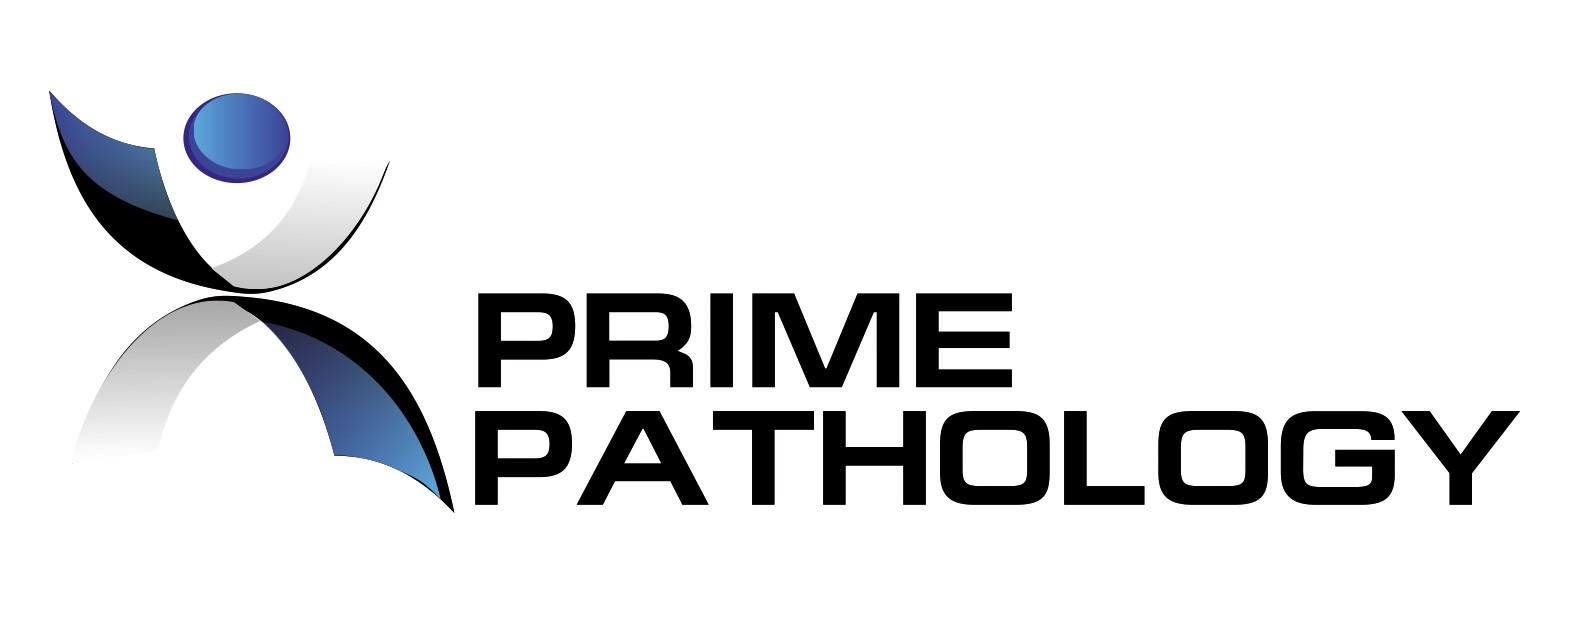 Prime PATHOLOGY